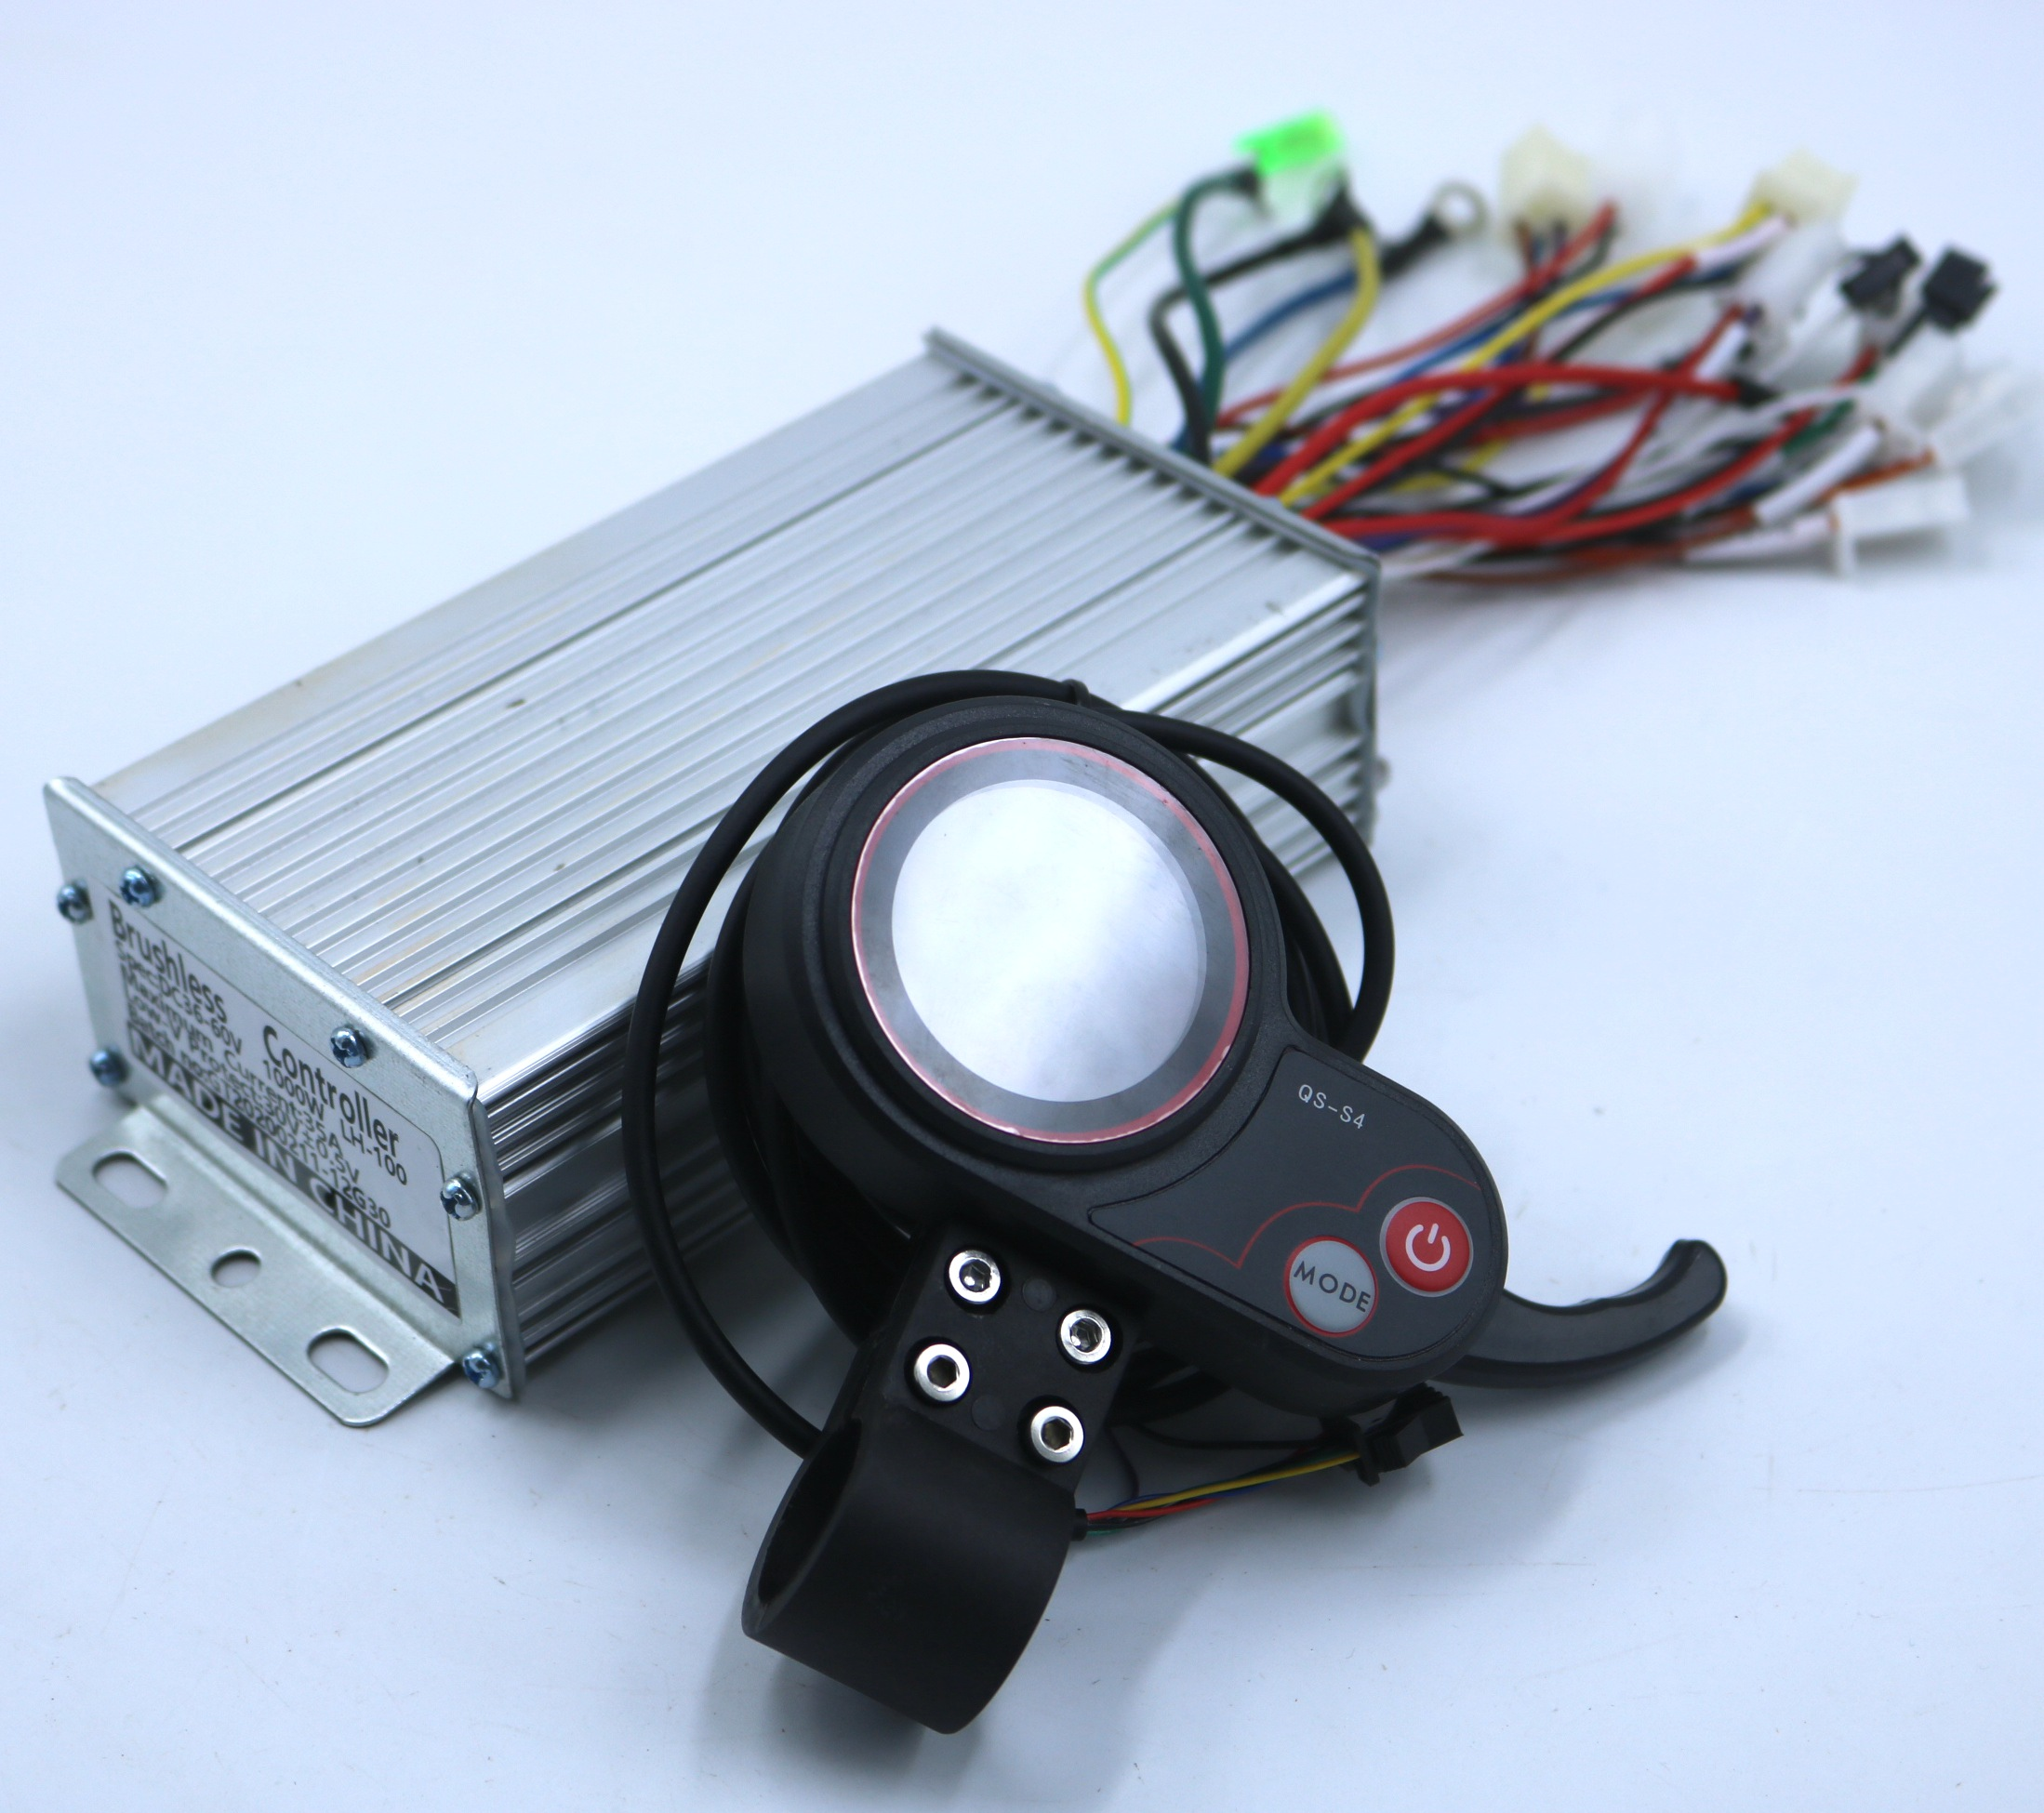 GREENTIME GREENTIME 36 V/48 V/60 V 800/1000W BLDC חשמלי קטנוע בקר e-אופניים brushless מהירות נהג QS-S4 LCD תצוגת אחת סט